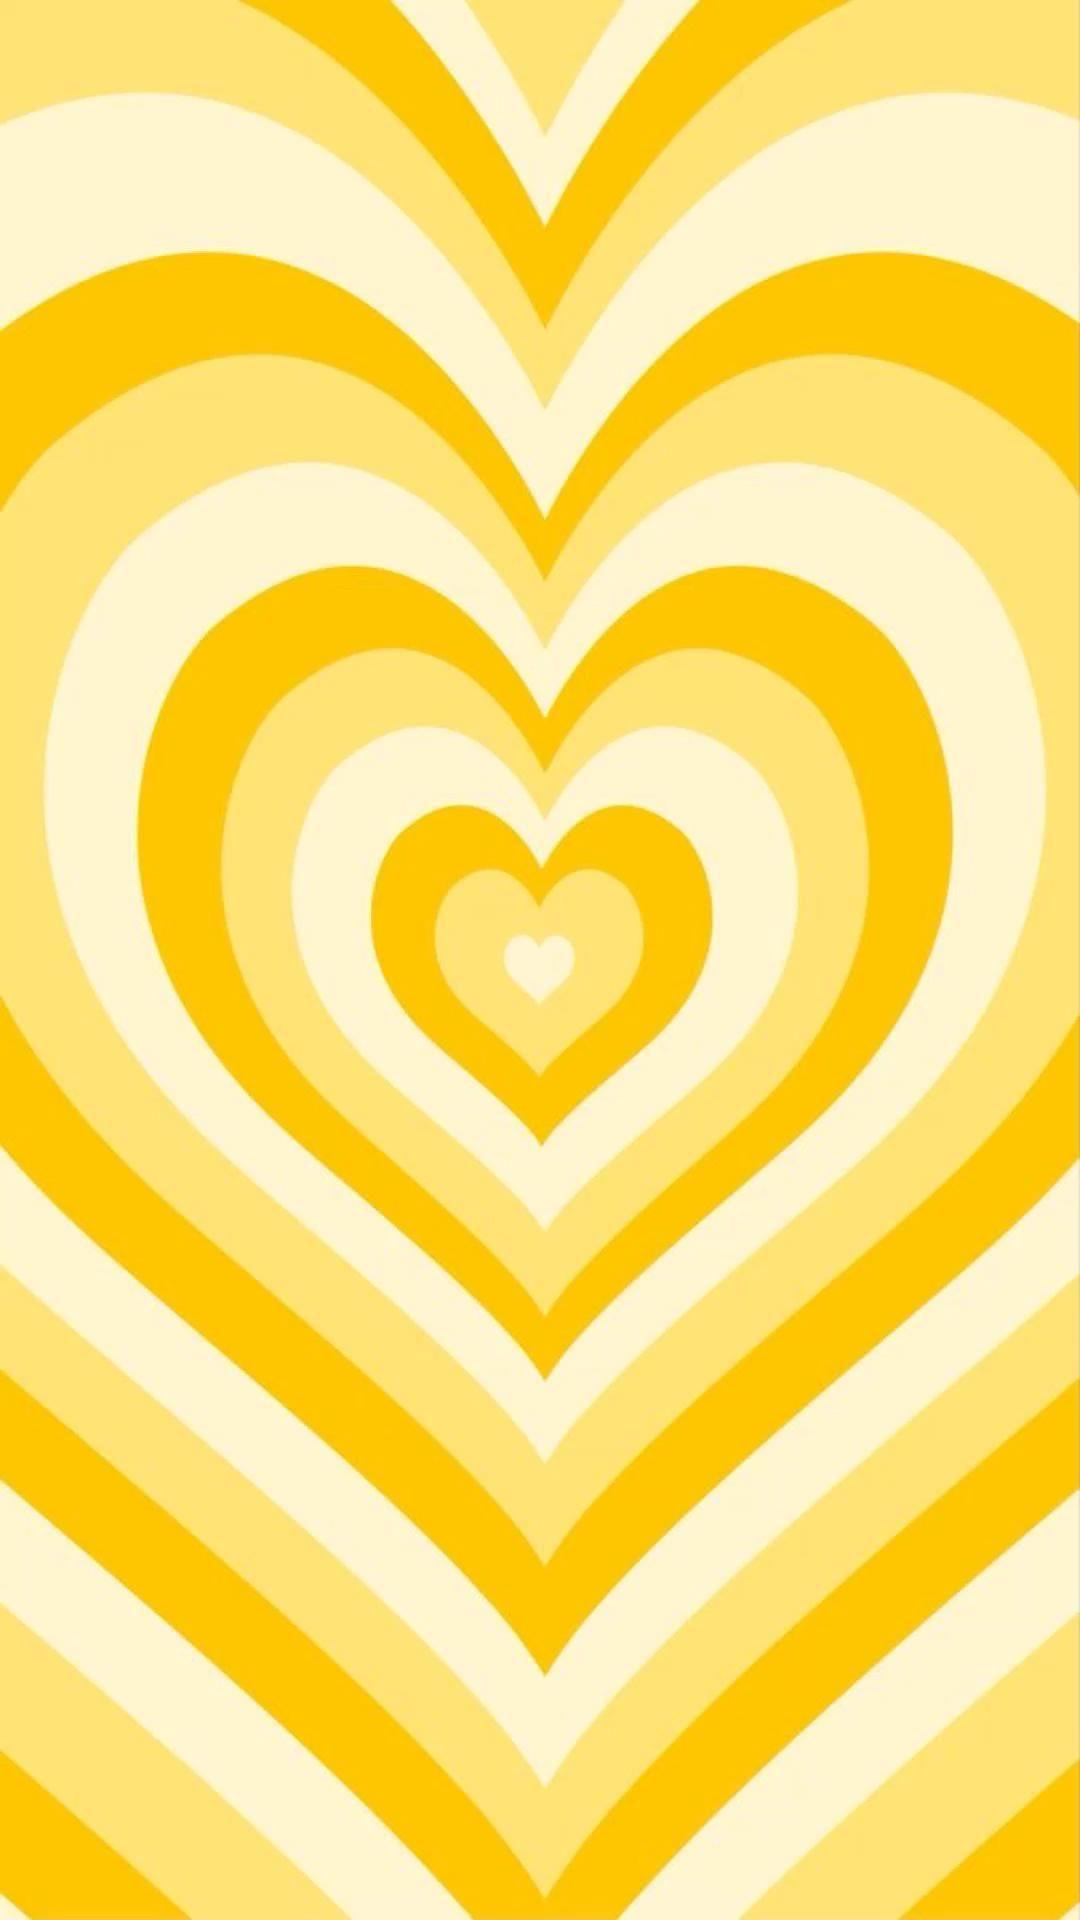 yellow wallpapers                  #yellow #wallpaper #aesthetic #yellowwallpaper